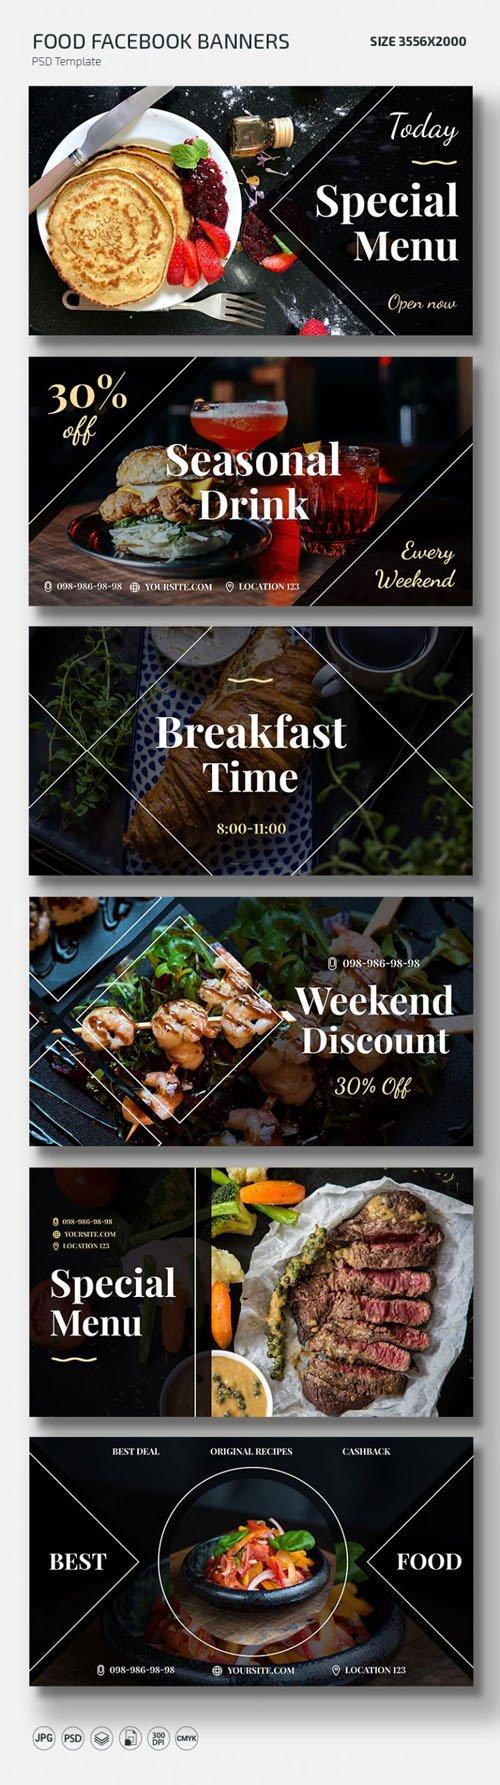 6 Food Facebook Banners PSD Templates